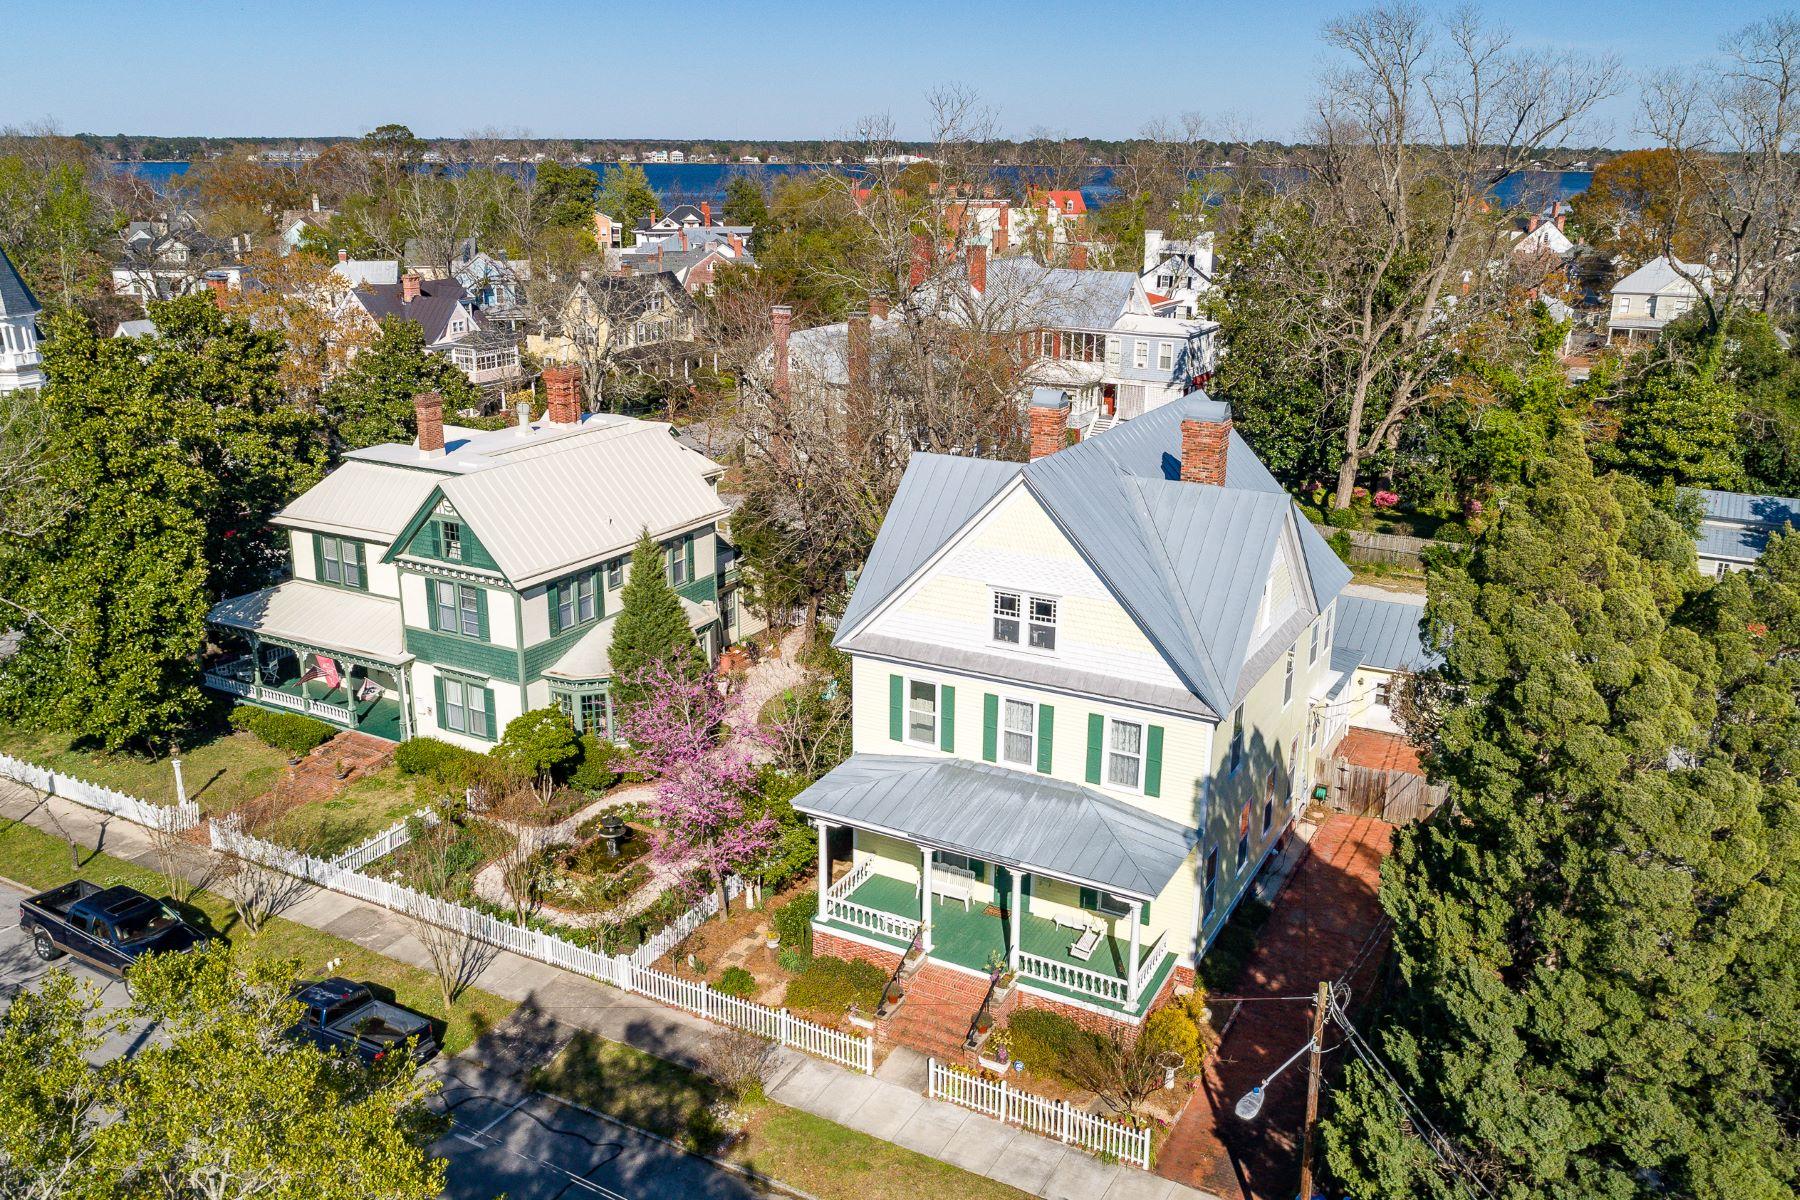 Single Family Homes vì Bán tại Impeccable Victorian Home in Historic District 512 Middle St., New Bern, Bắc Carolina 28560 Hoa Kỳ